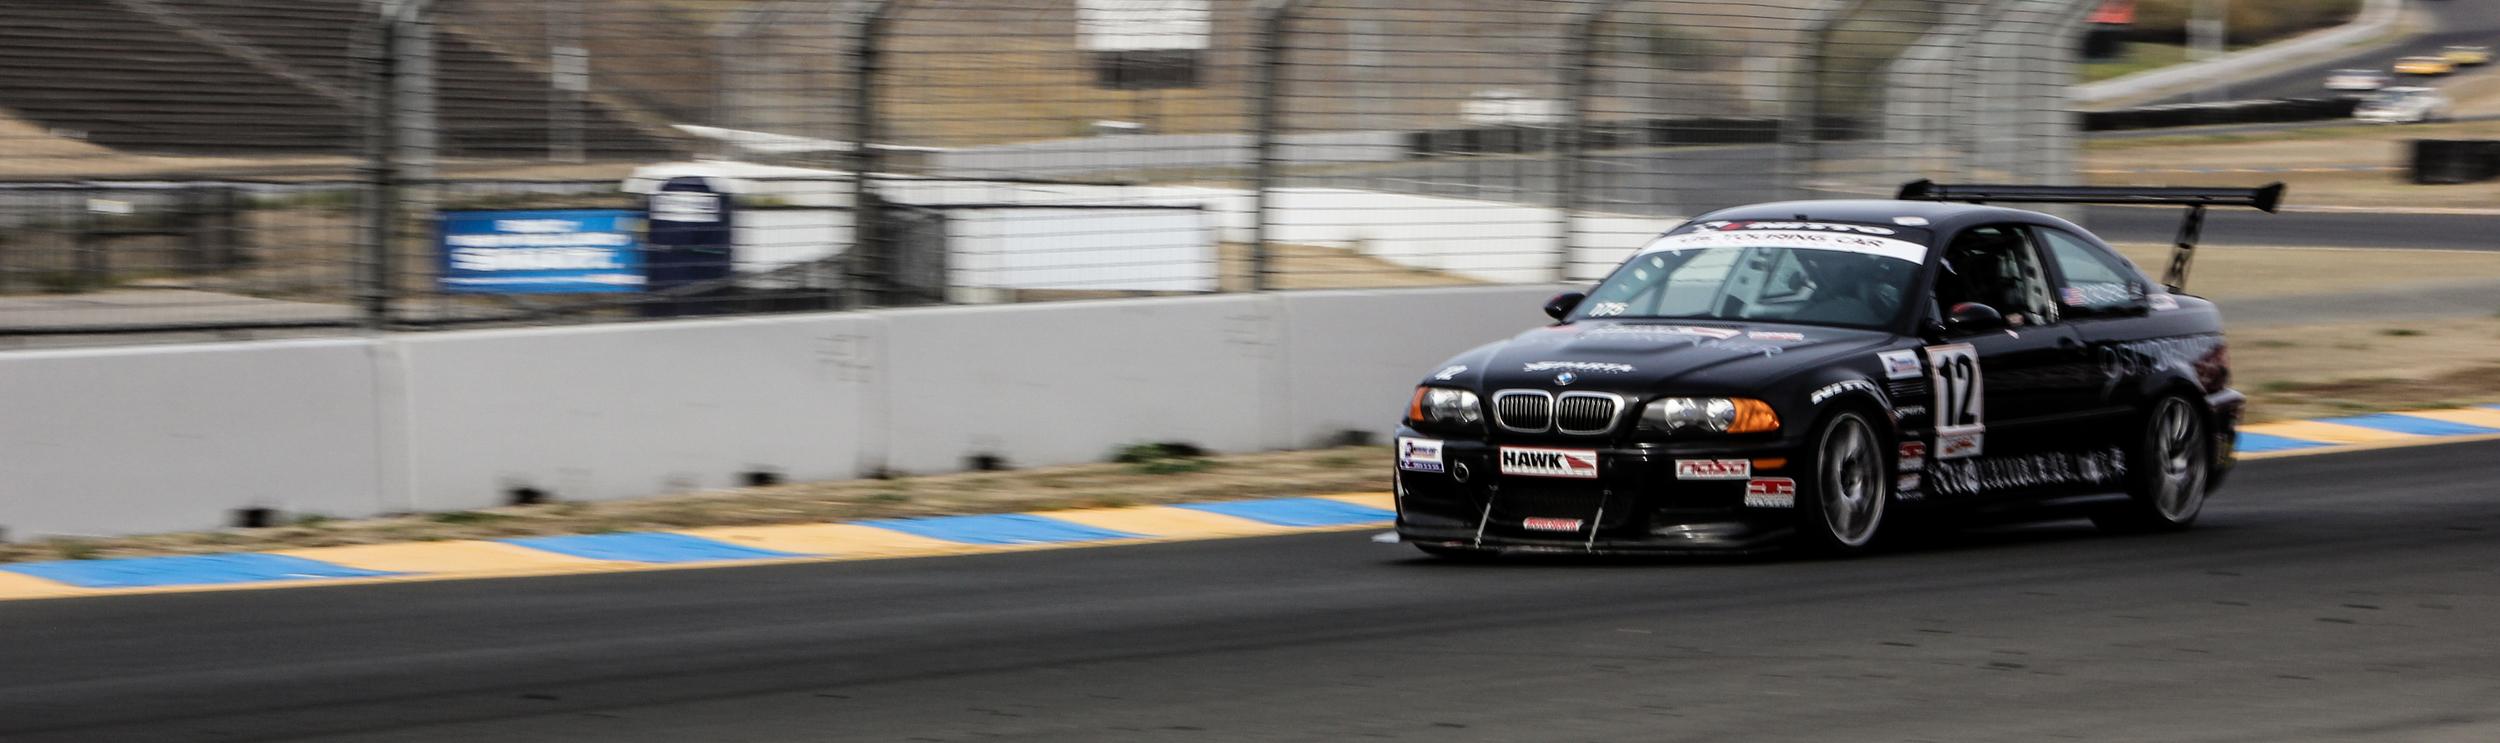 2015-10_RACE_Sonoma_USTCC_Cedric_2806.jpg